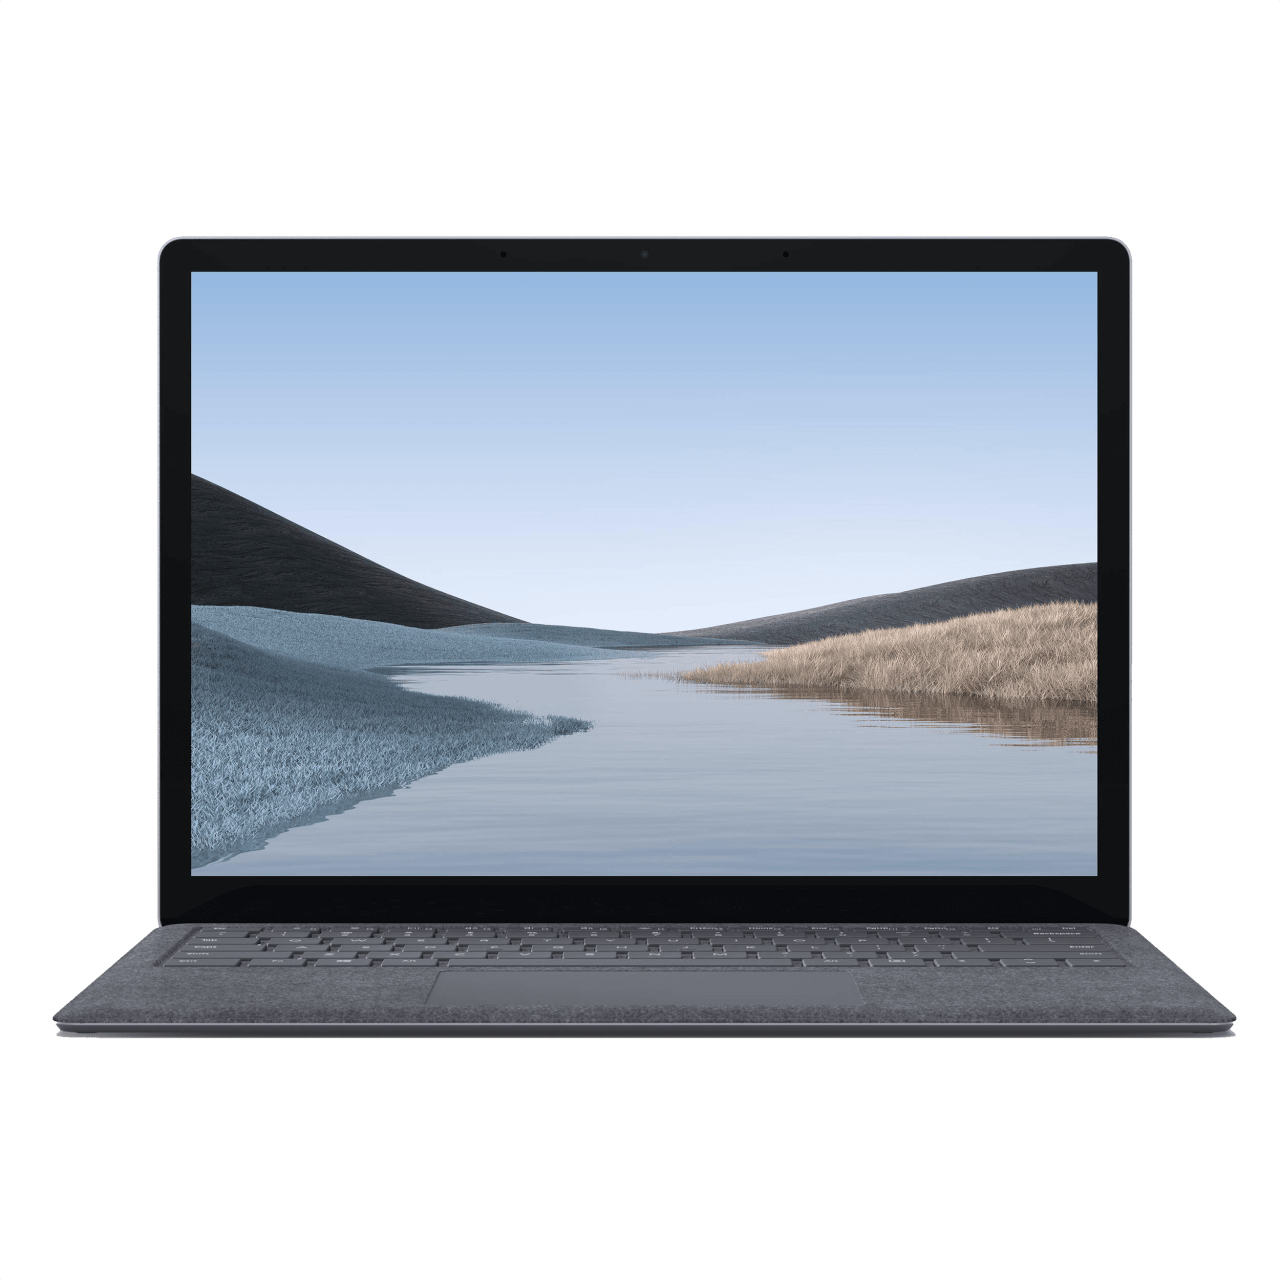 Platinum (Fabric) Microsoft Surface Laptop 3.1